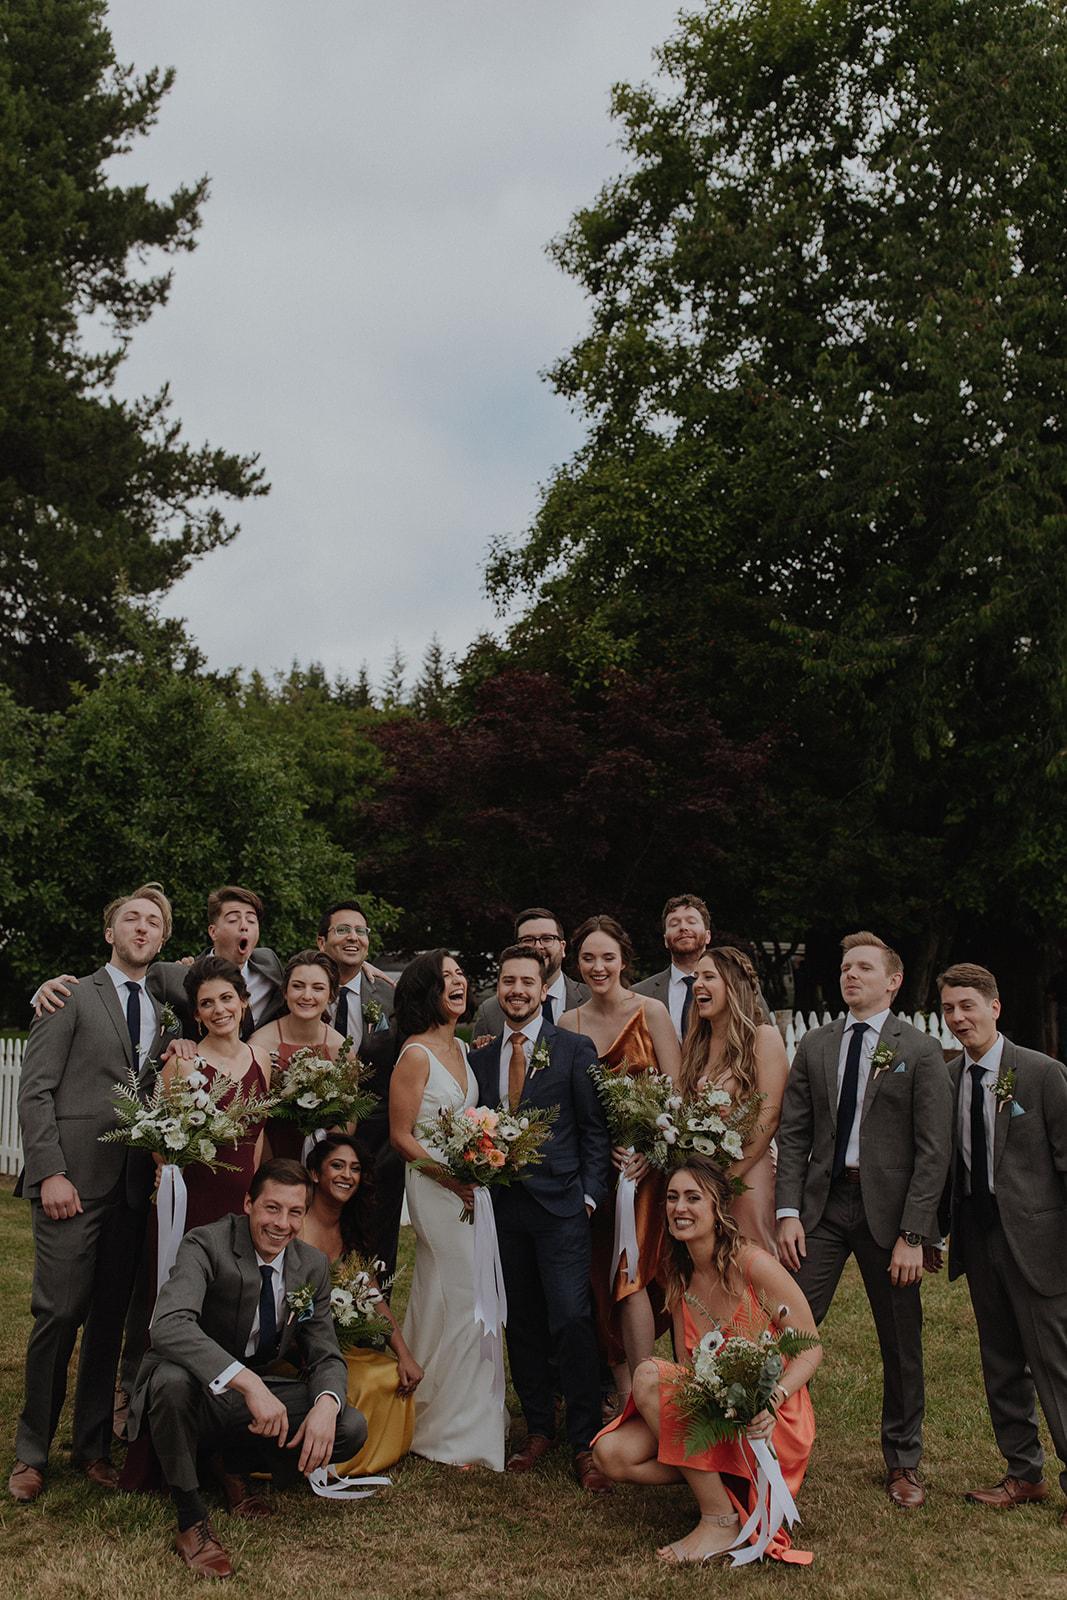 cortney_skye_wedding_june2019-187.jpg